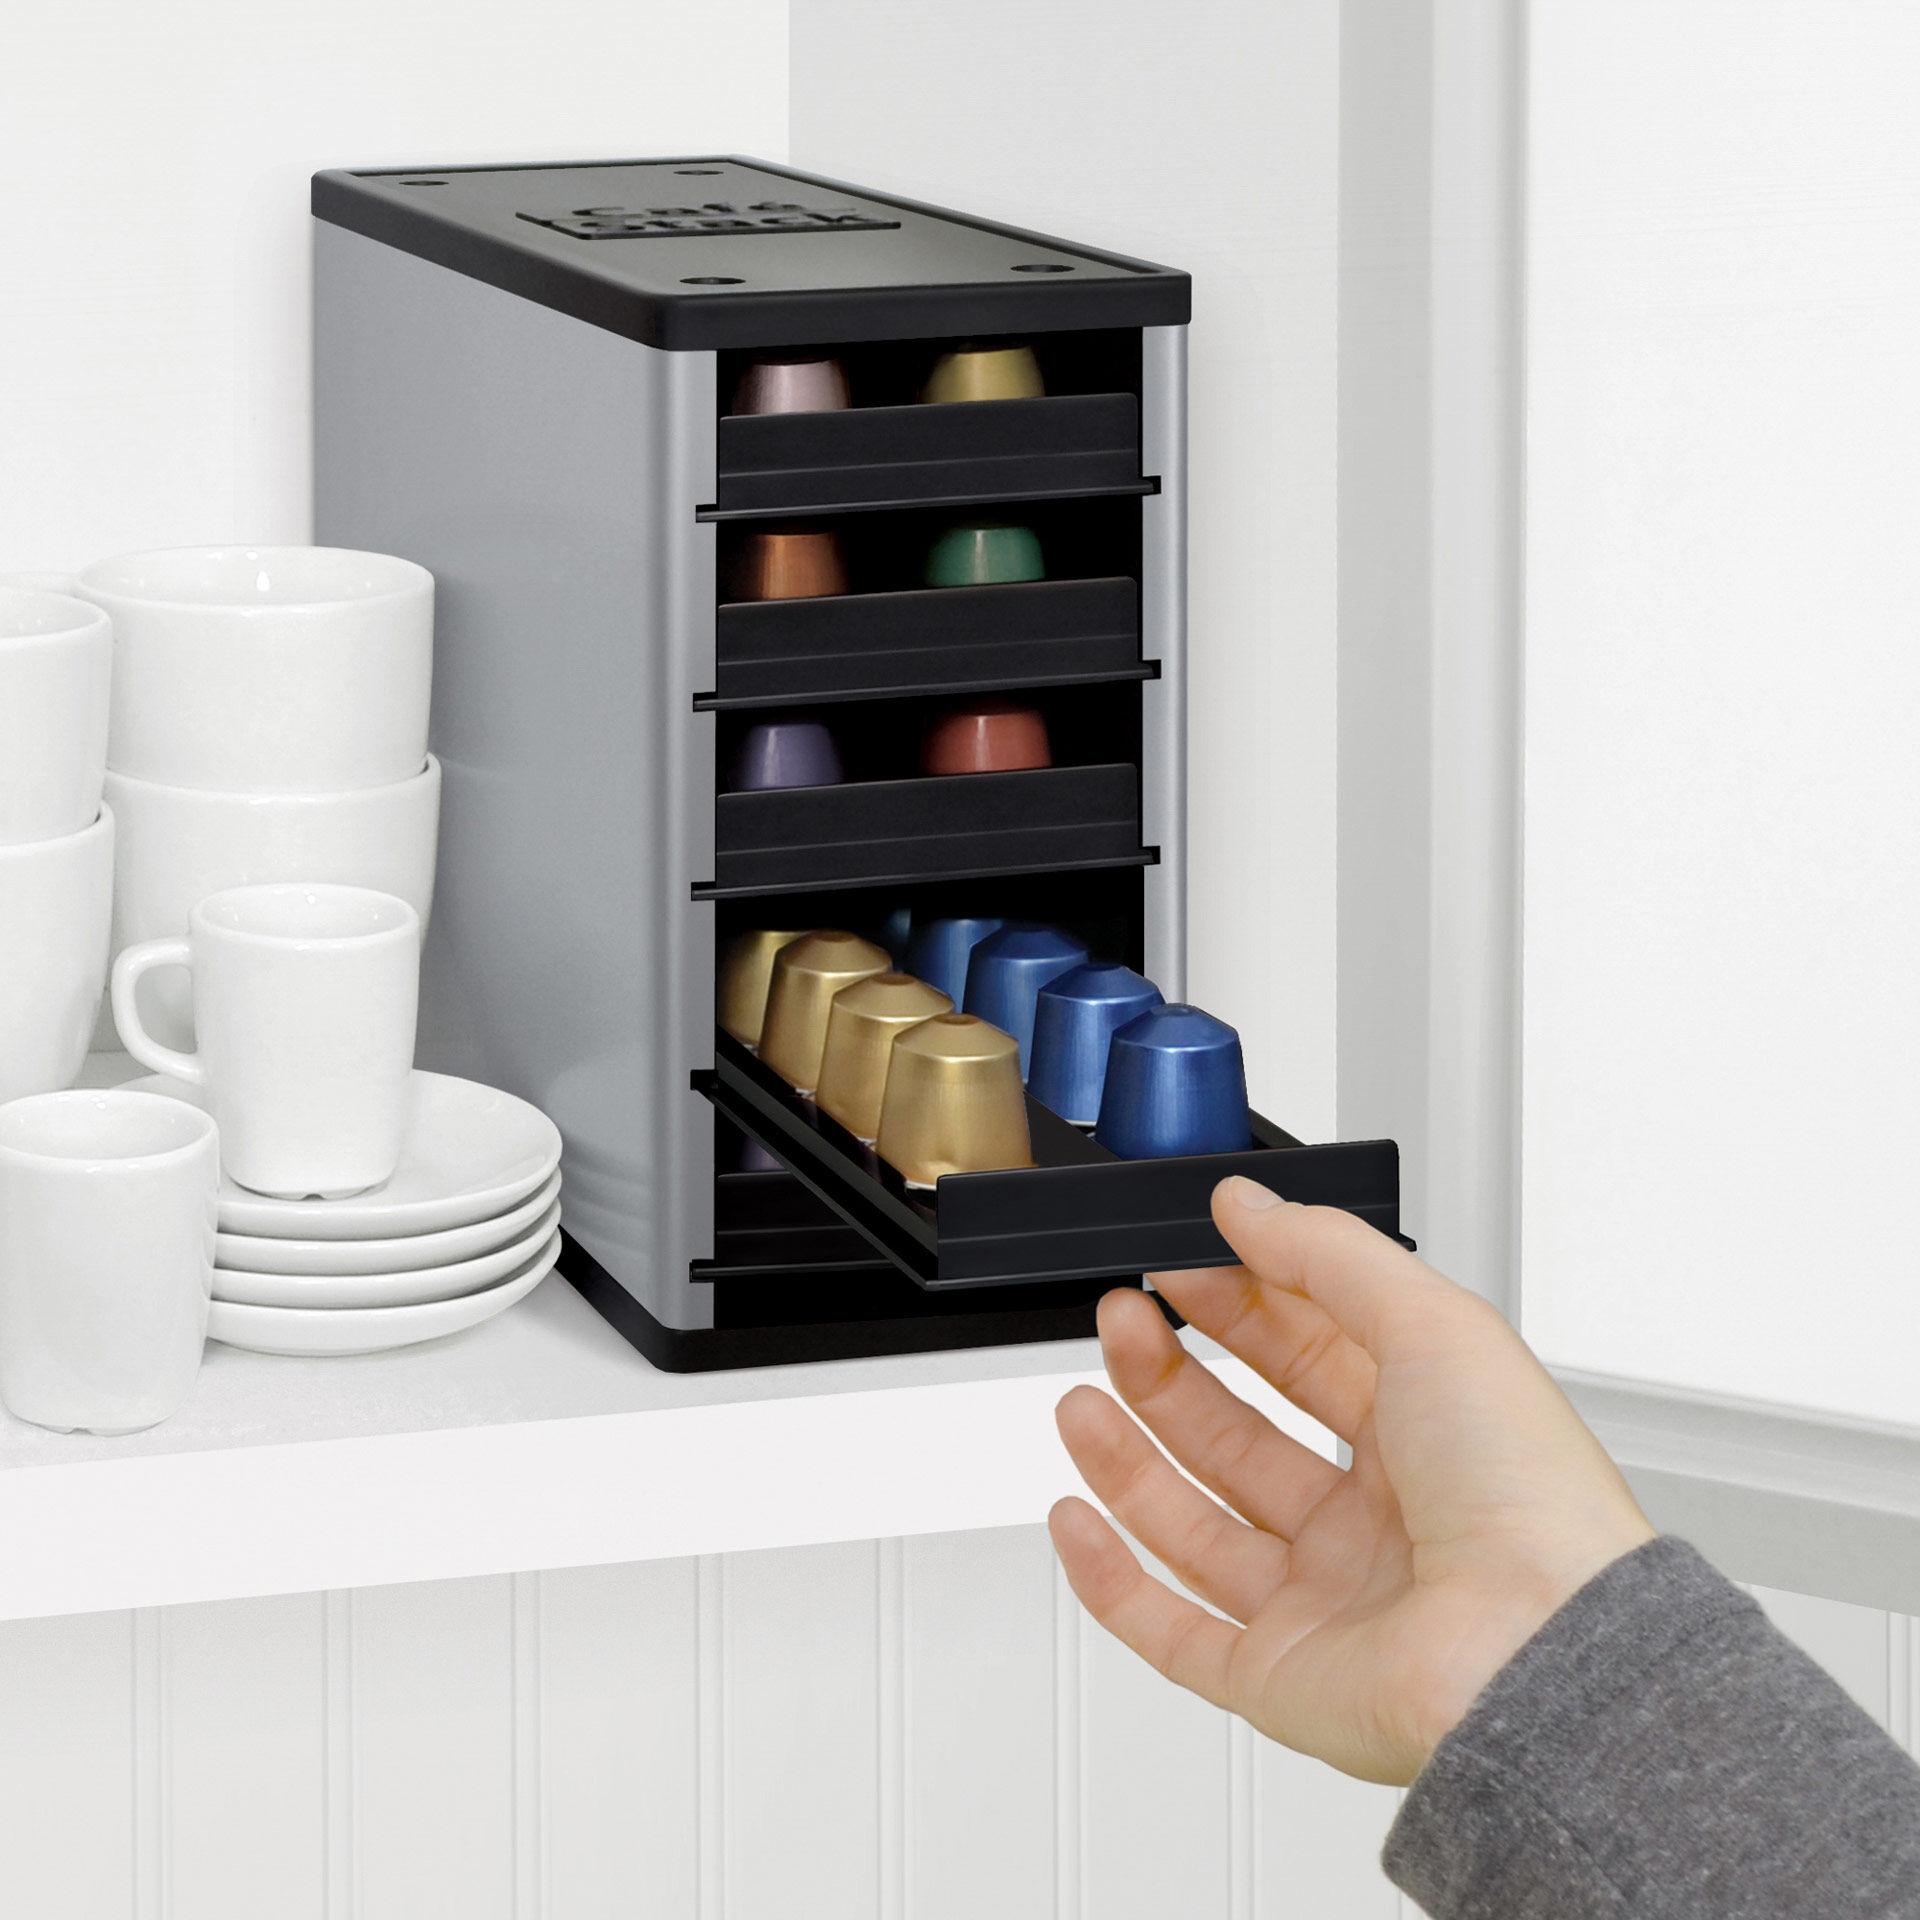 Porte-capsule pour machine à café Nespresso, , large